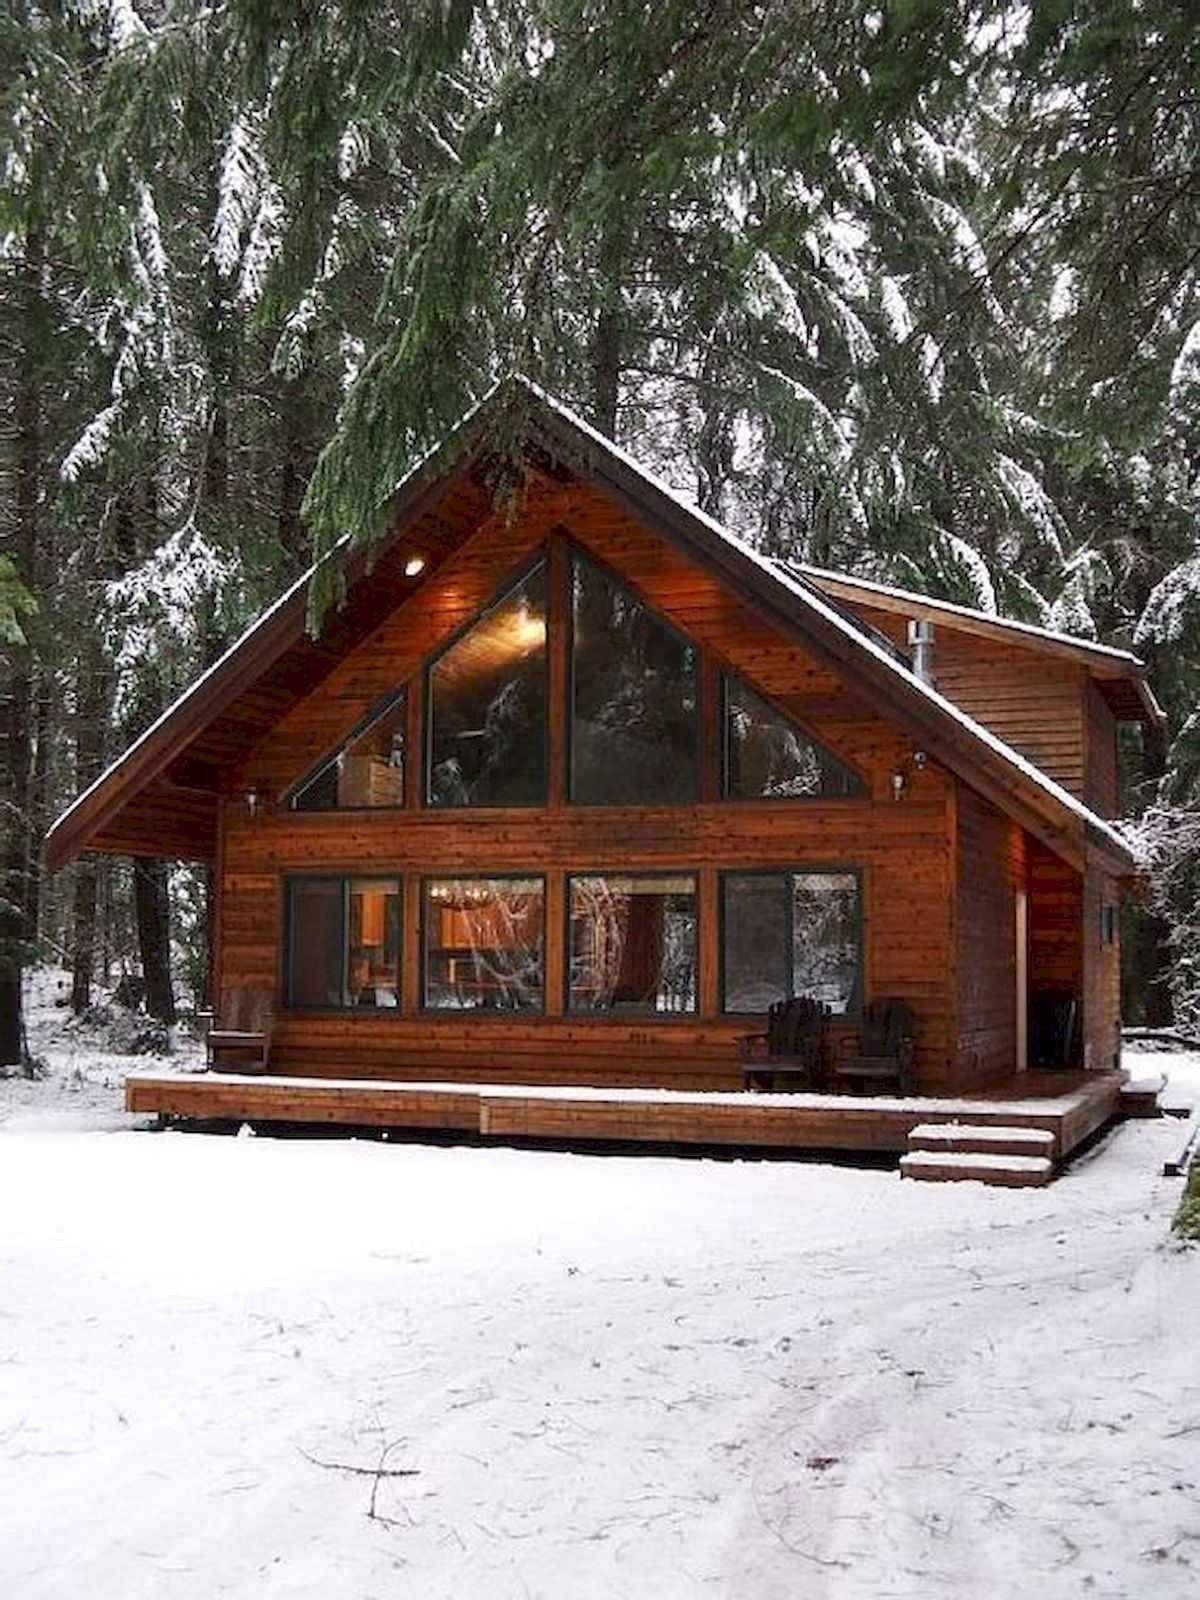 75 Best Log Cabin Homes Plans Design Ideas In 2020 With Images Small Log Cabin Cabin Plans With Loft Cabin Homes